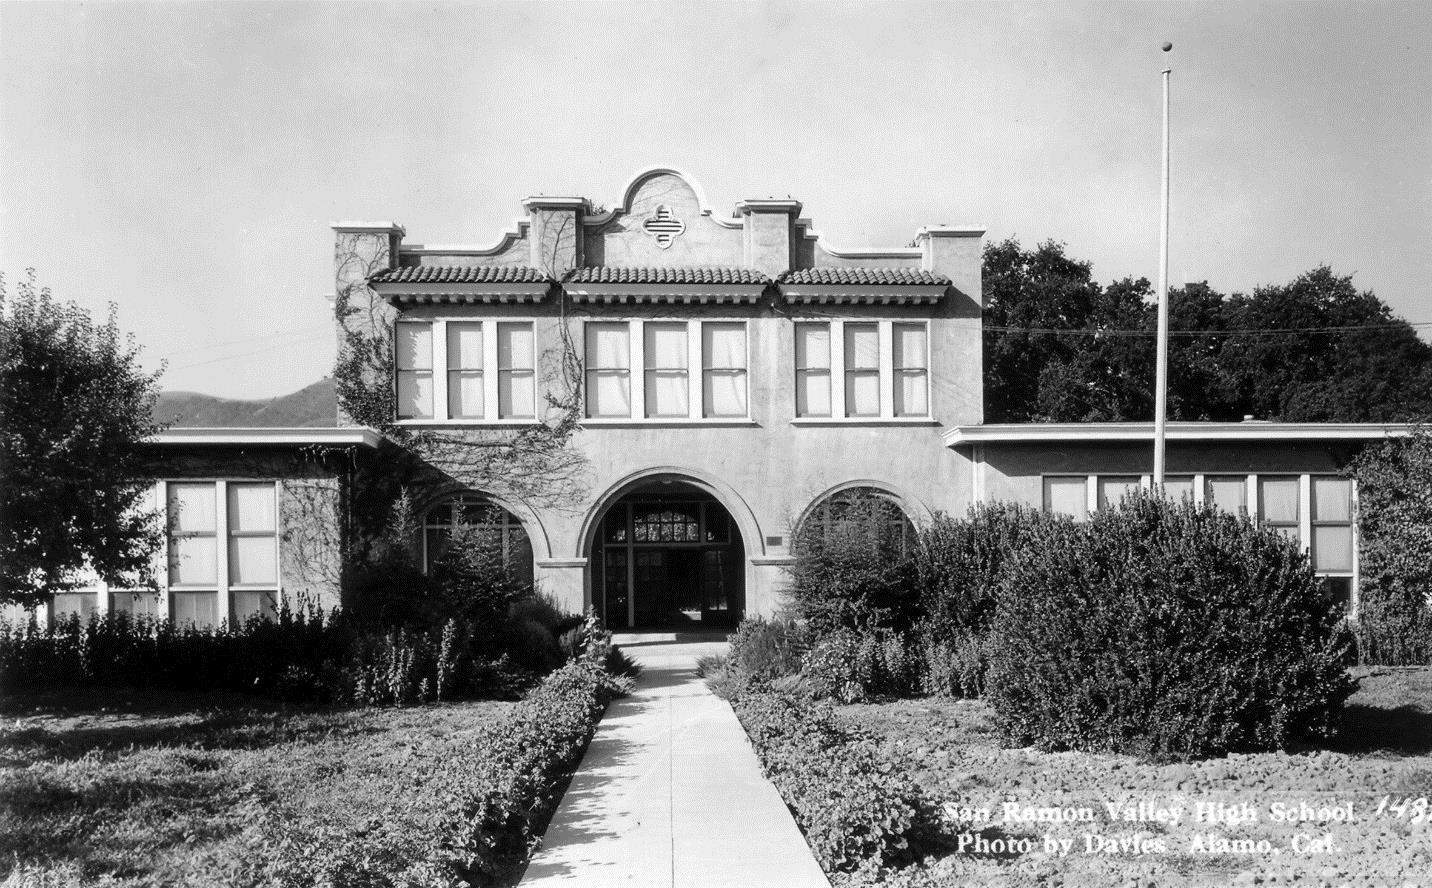 San Ramon Valley Union High School  1948